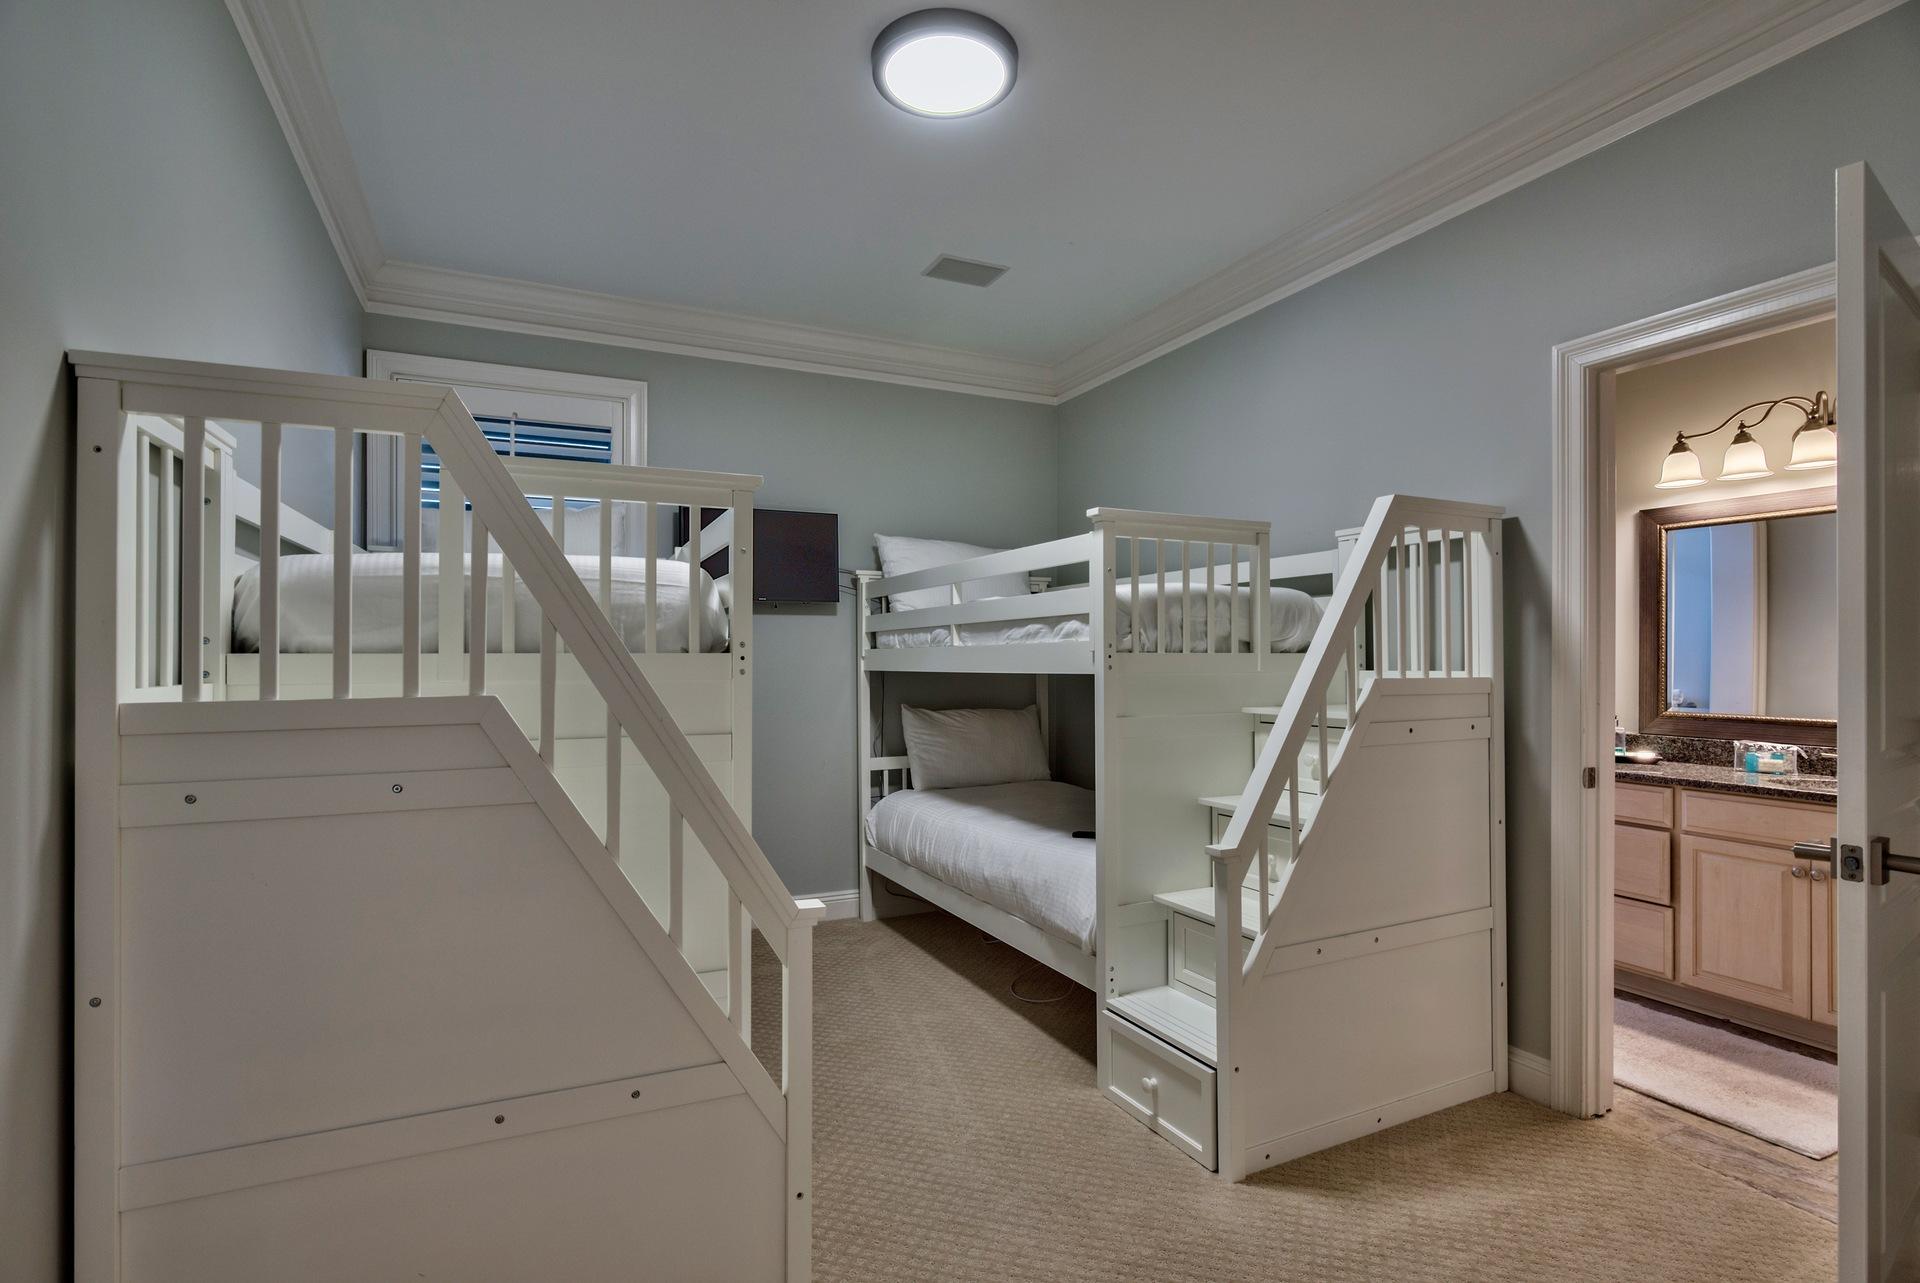 cartoblue interactive floor plans for vacation rental properties